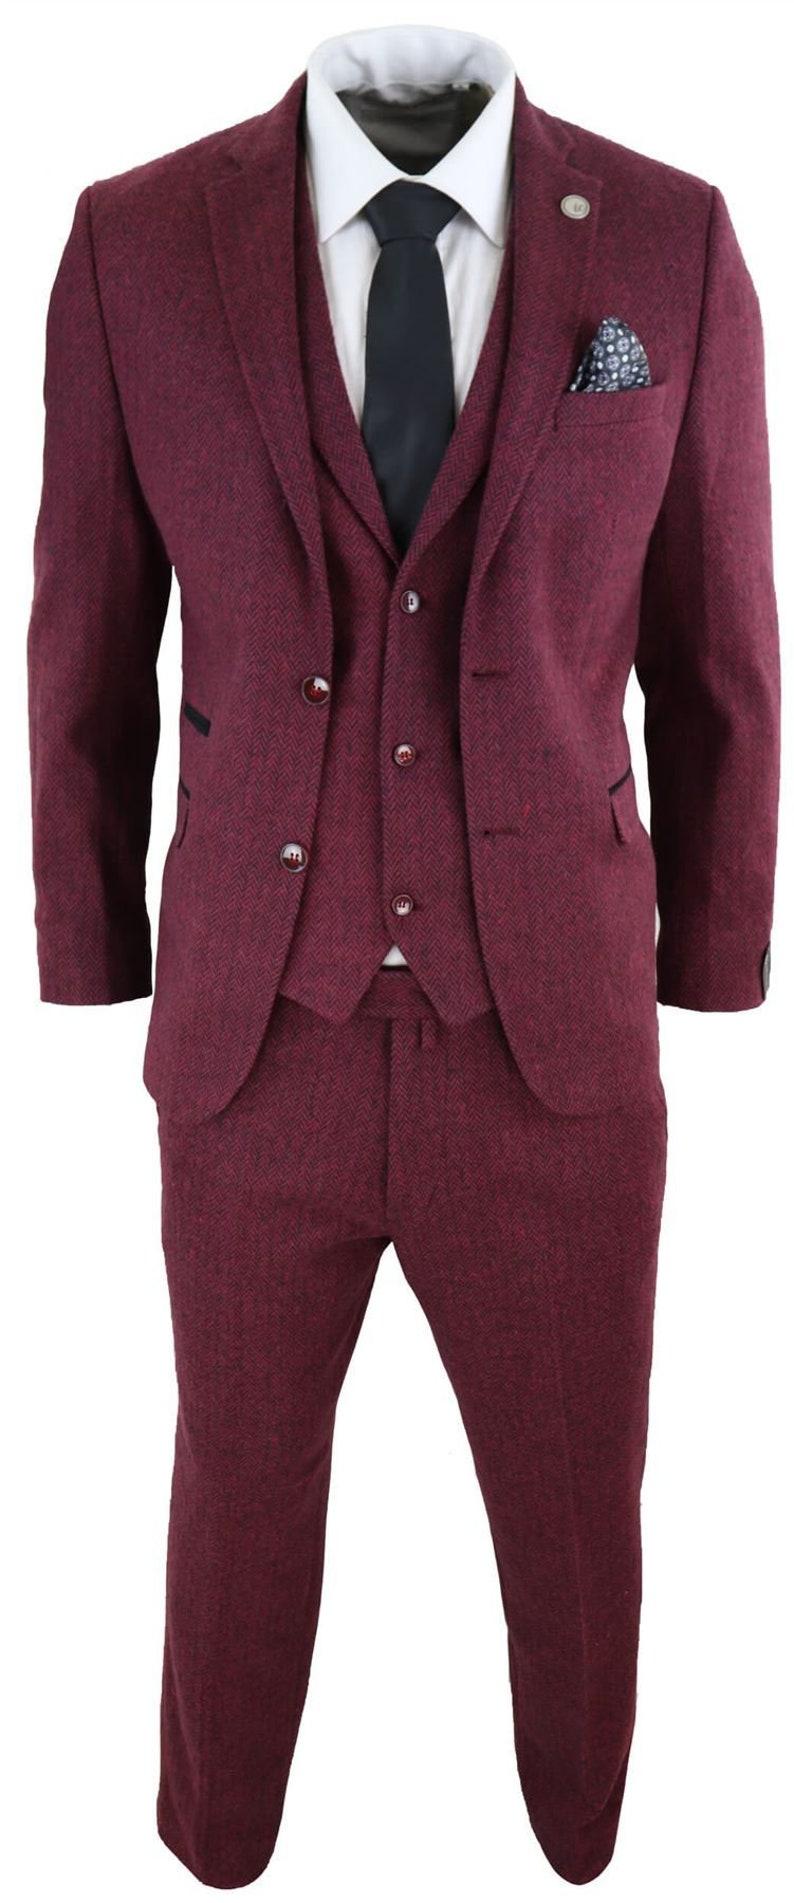 1960s Mens Suits | Mod, Skinny, Nehru     Mens wool 3 piece suit tweed burgundy black tailored fit  classic $187.55 AT vintagedancer.com